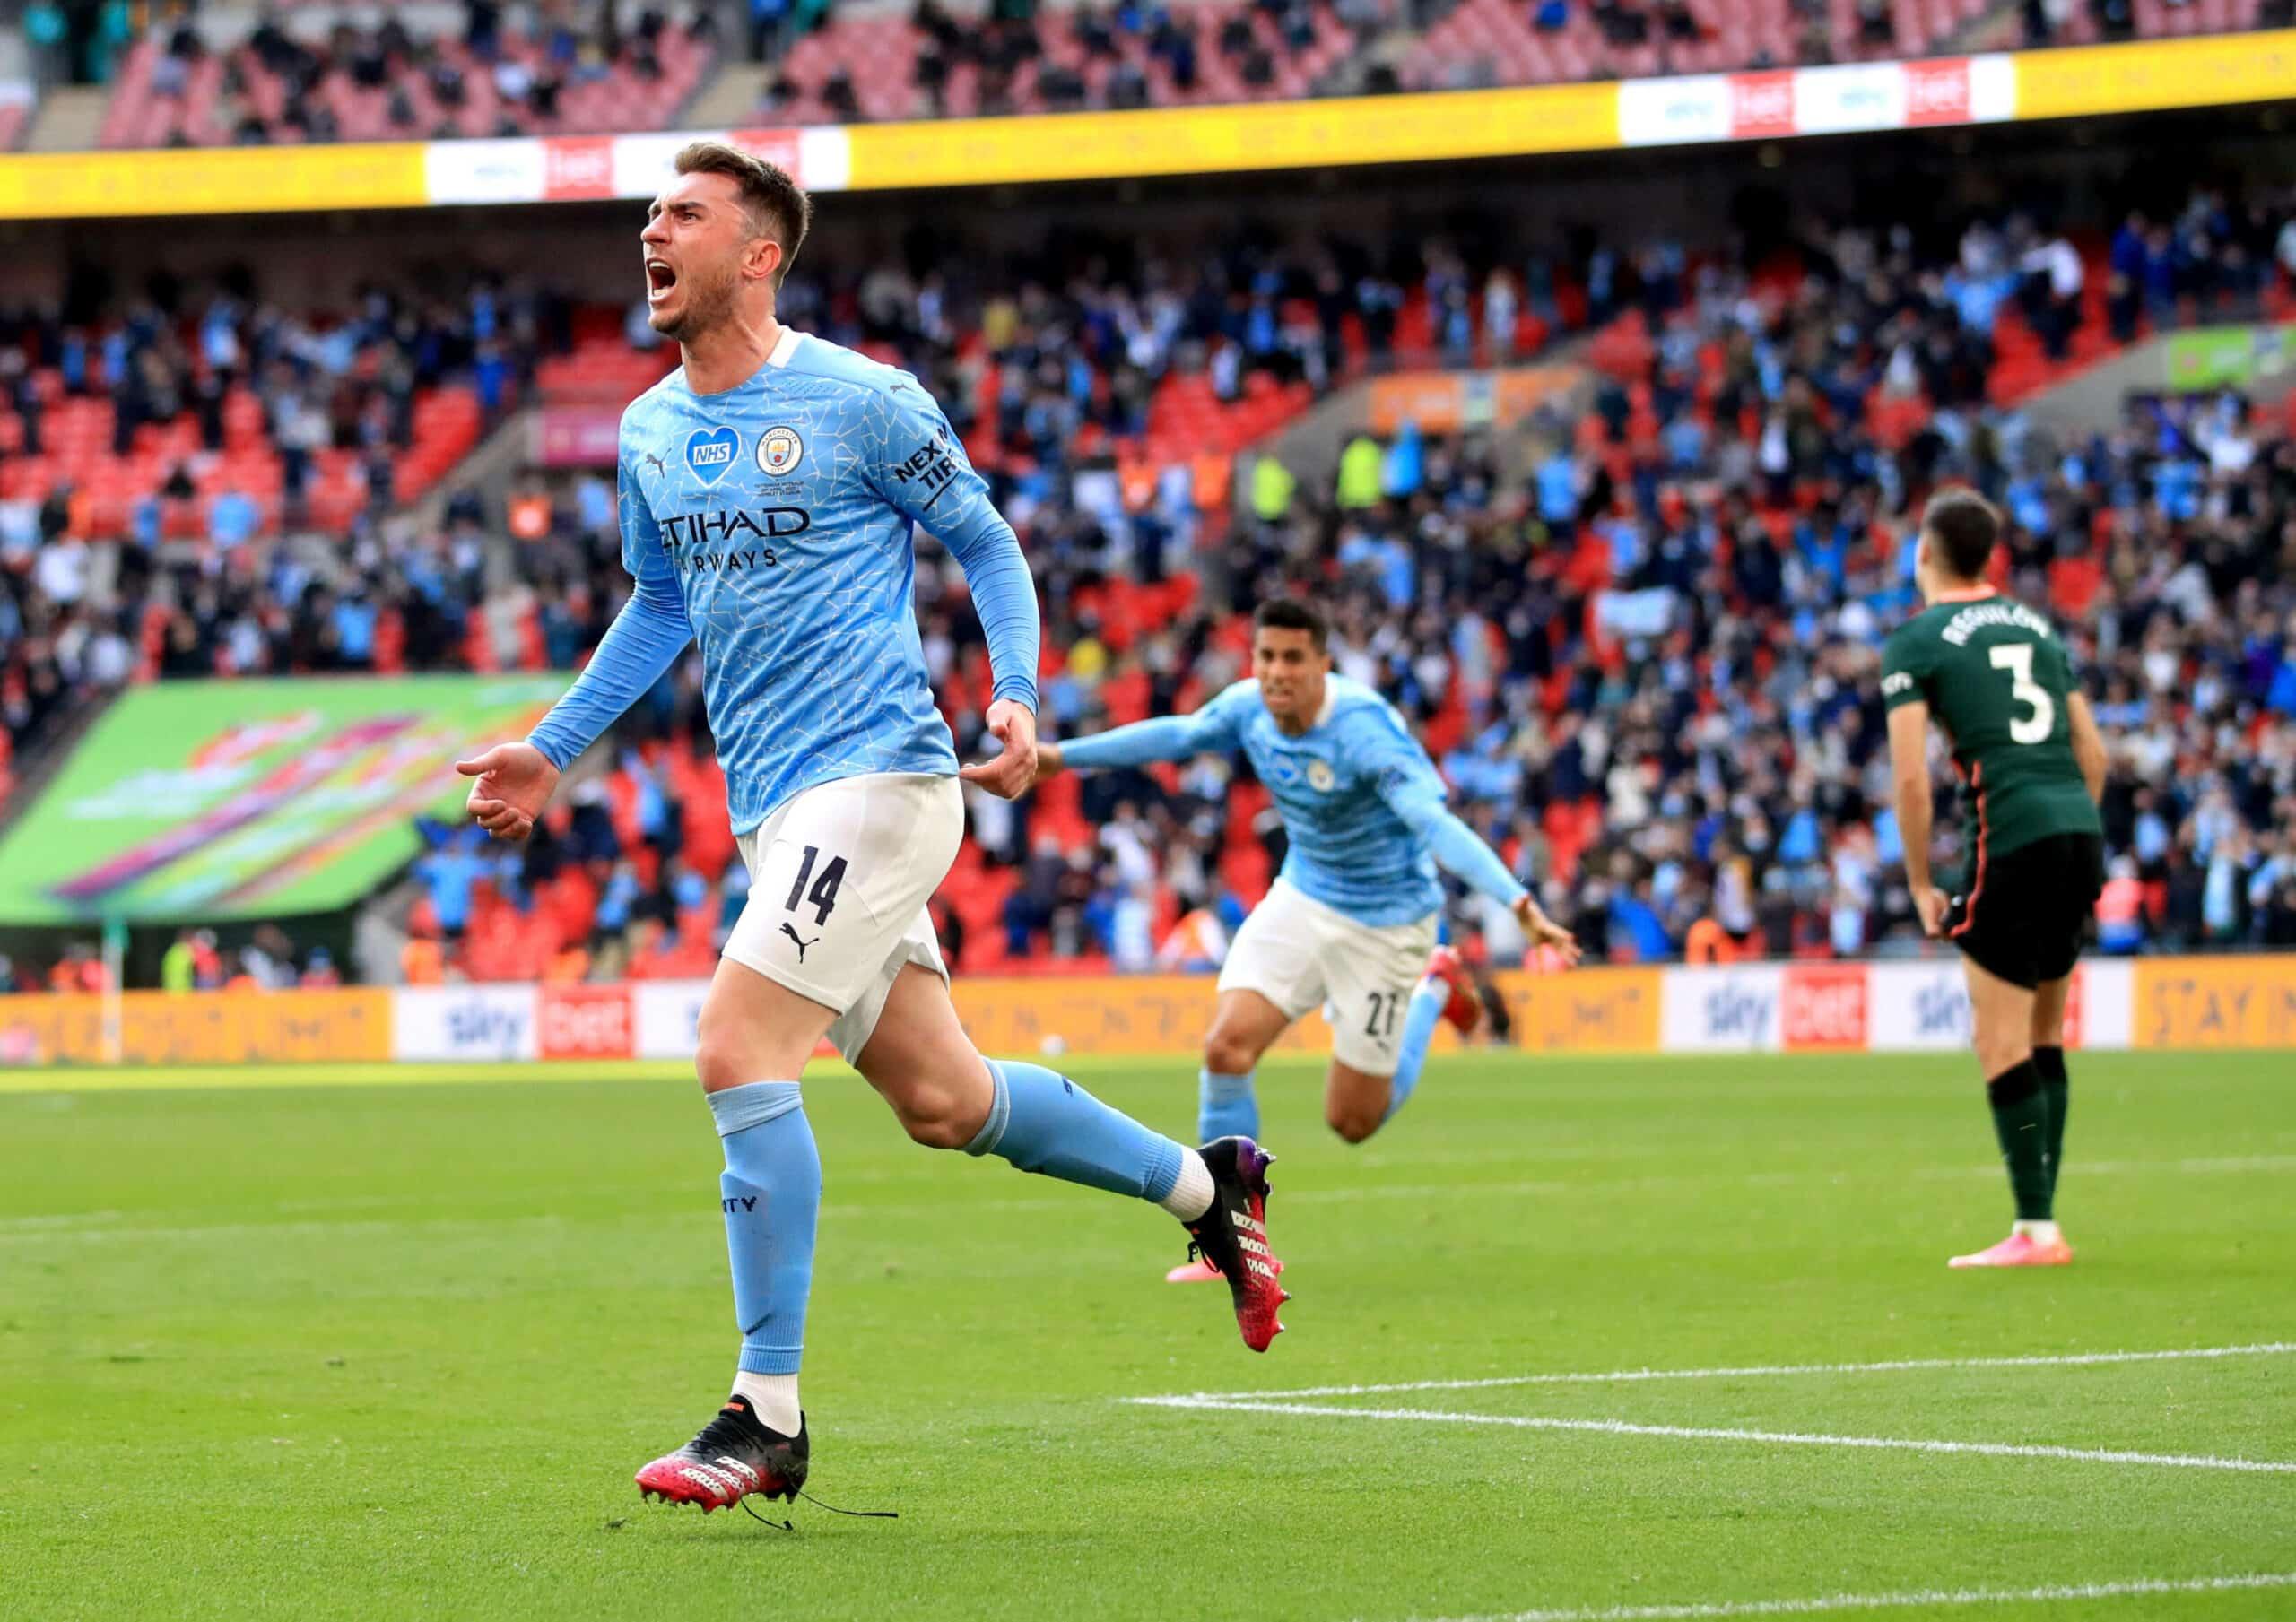 Manchester City Laporte